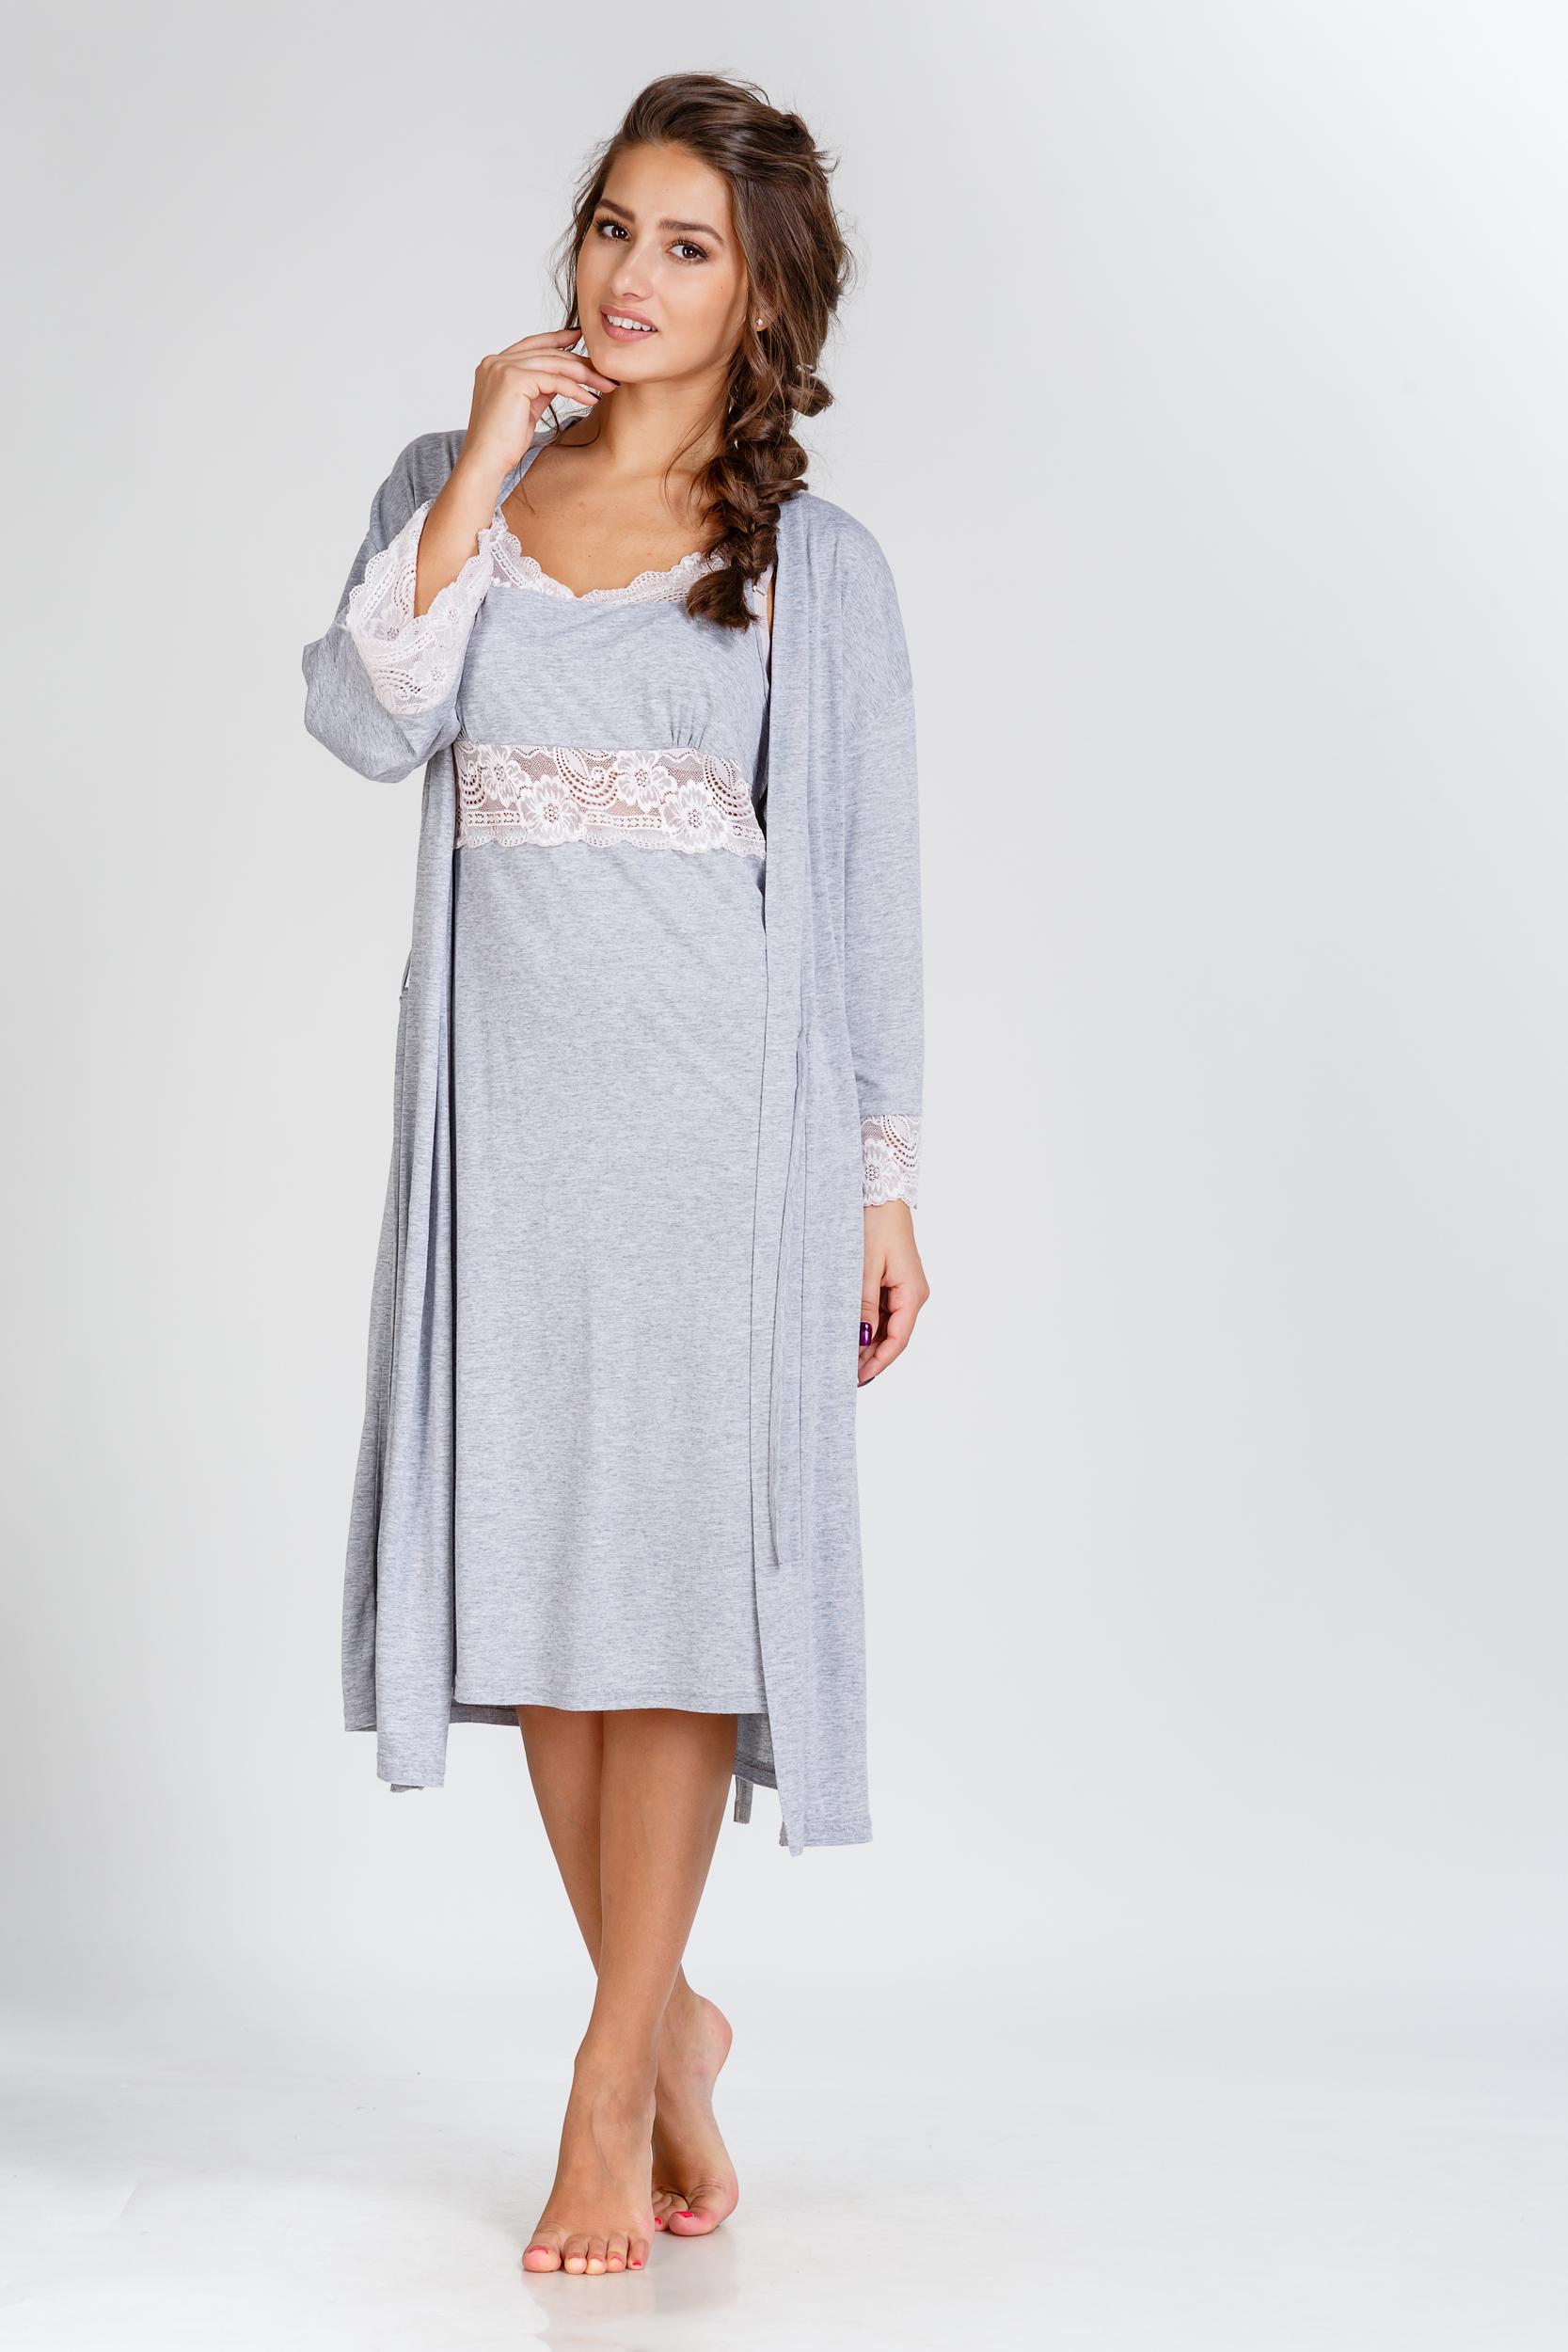 Домашние халаты Pastilla Домашний халат Ласса 2 Цвет: Серый Меланж (M-L) халаты домашние лори халат